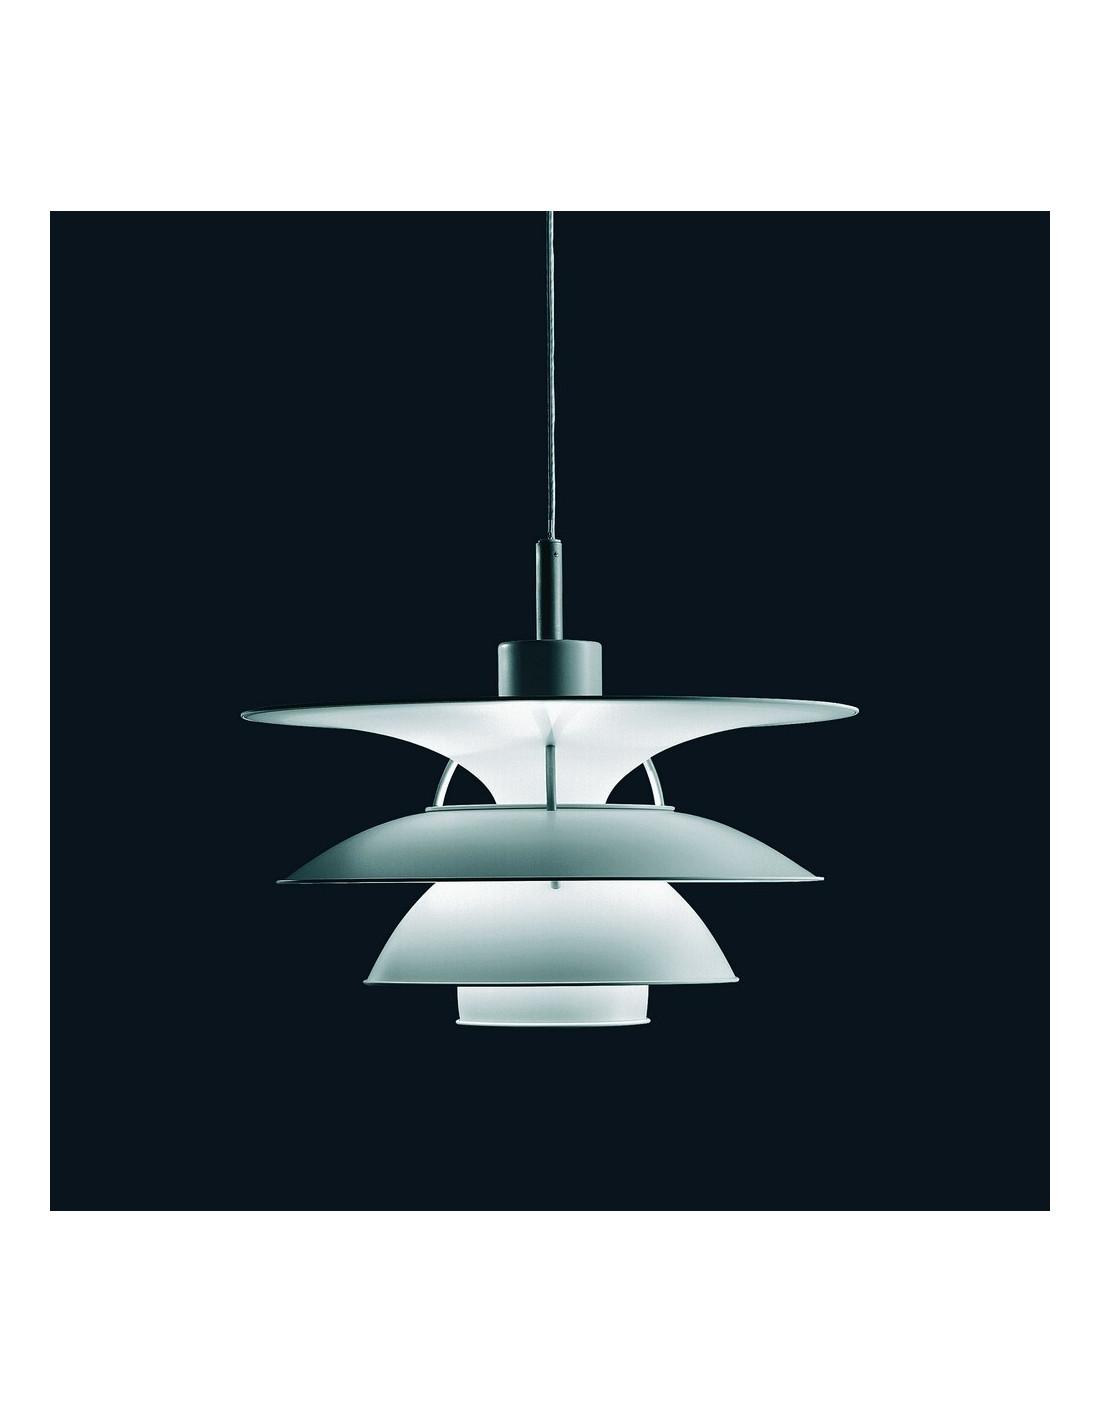 Ph 6 lampe - Cykelhjelm med led lys